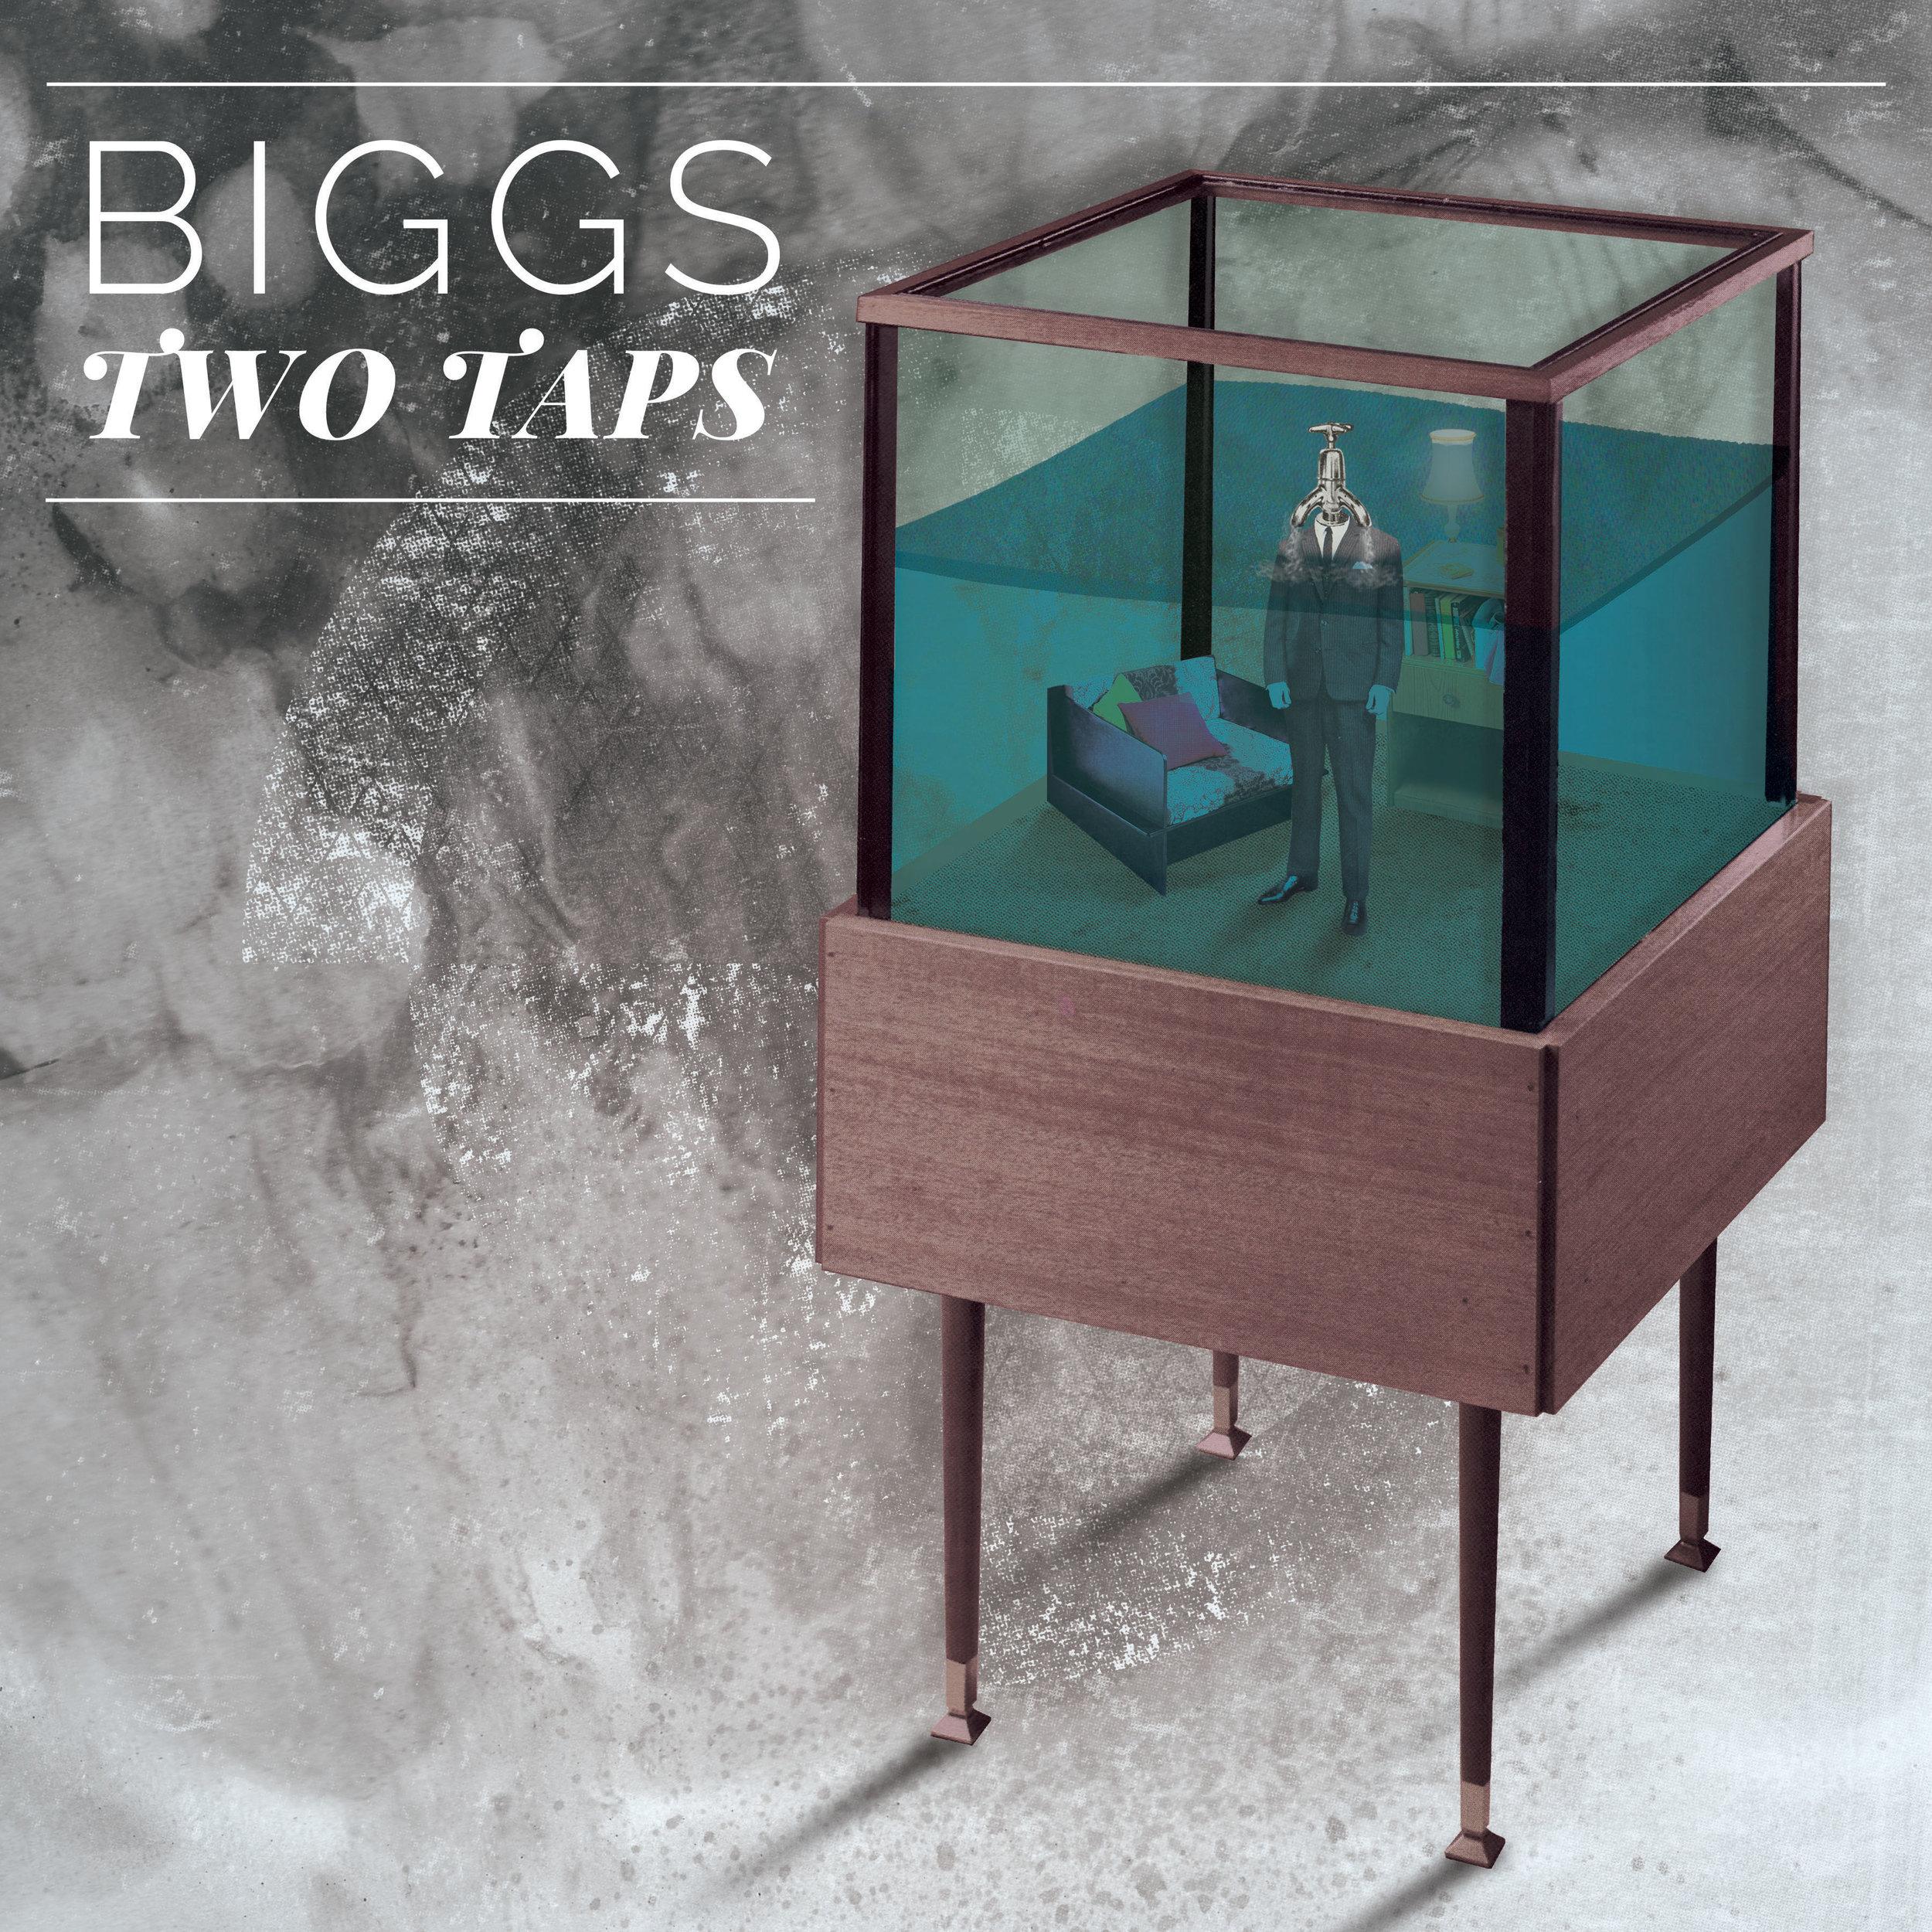 Biggs -Two Taps Medium RGB.jpg